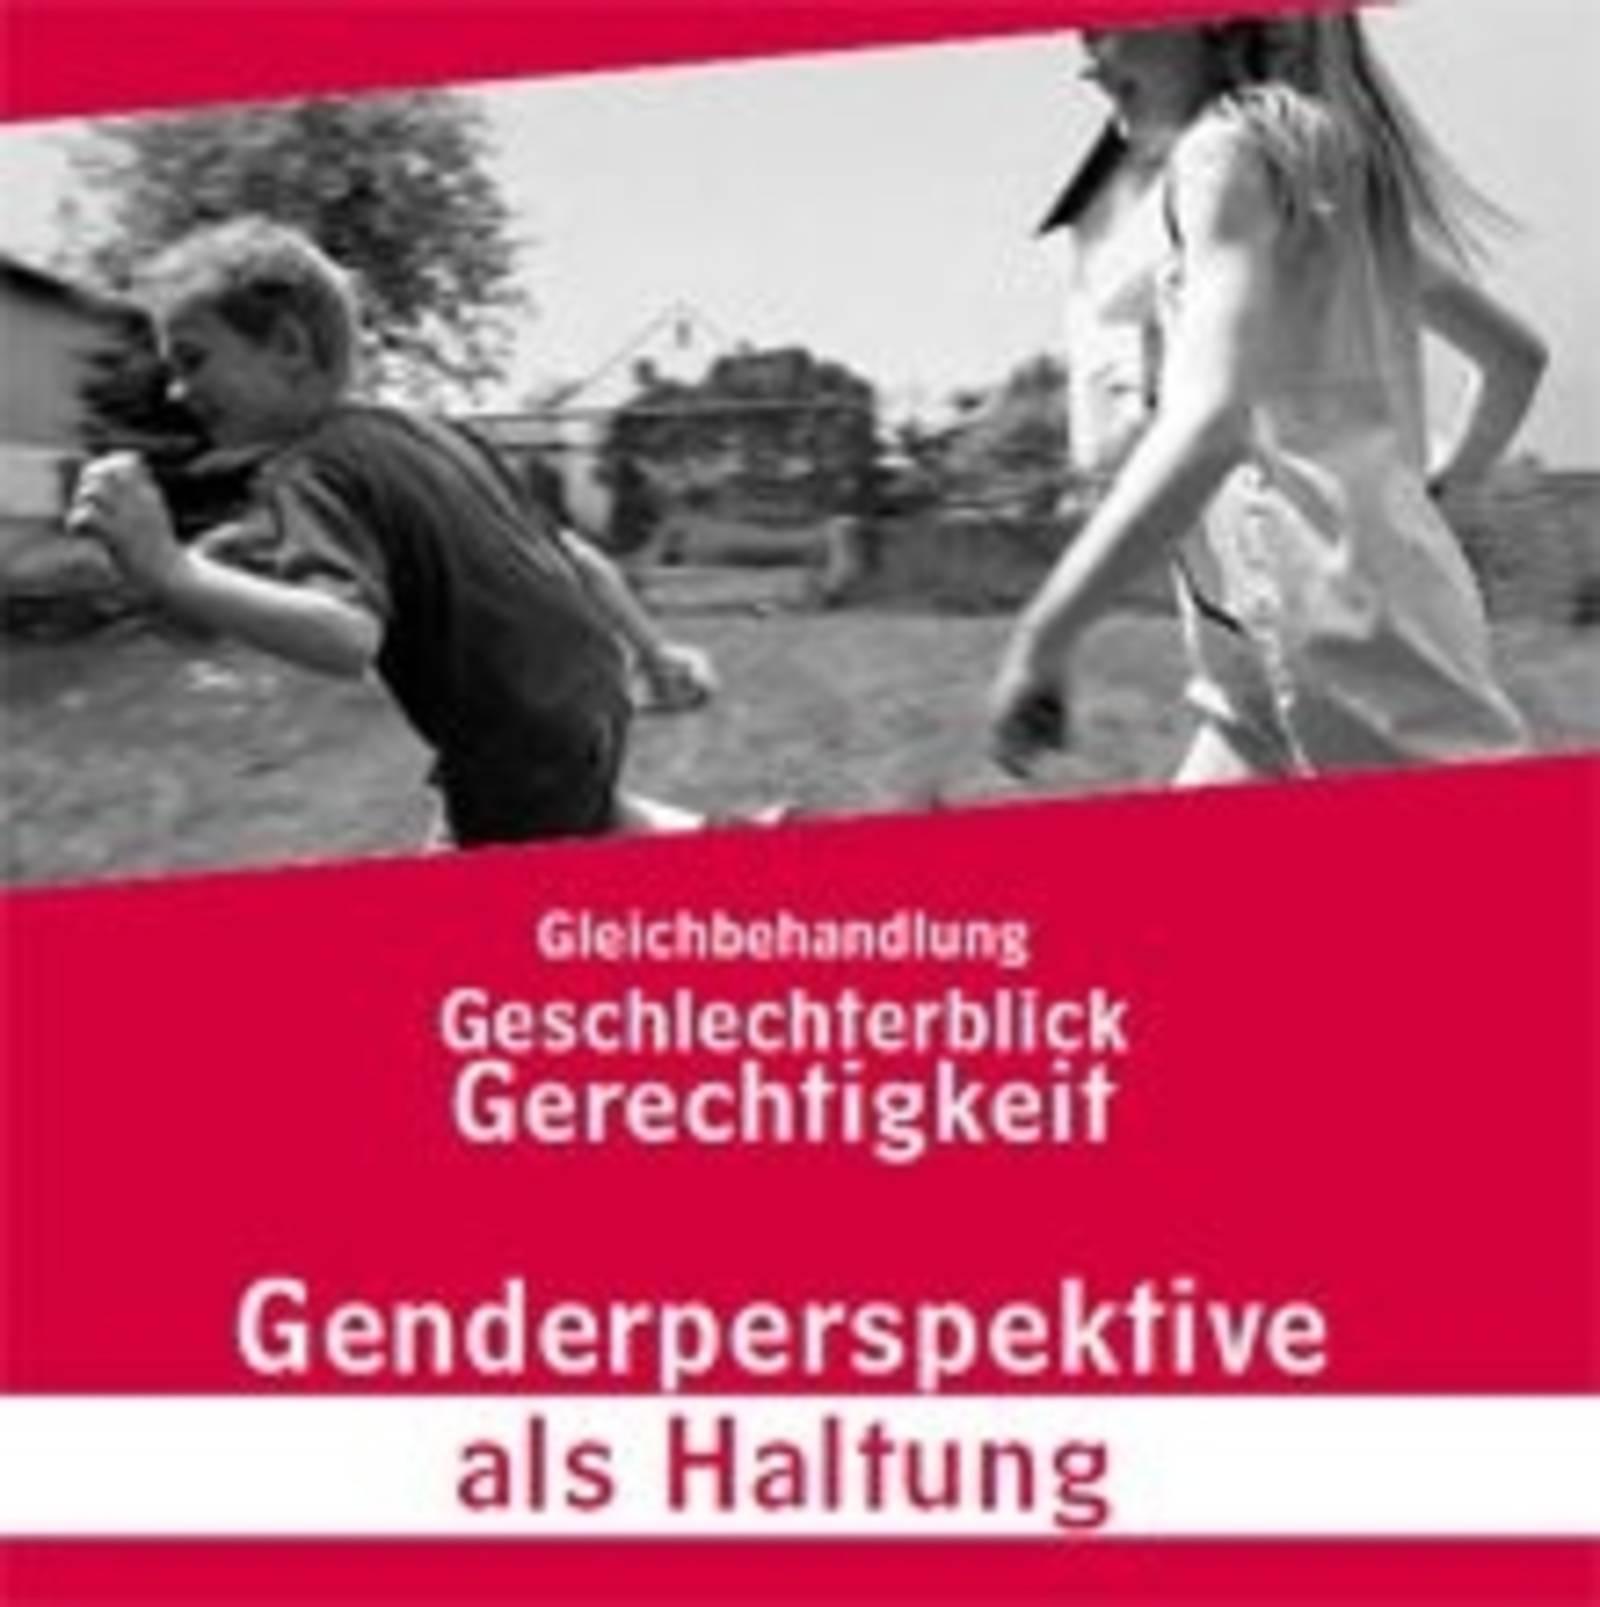 Genderperspektive als Haltung